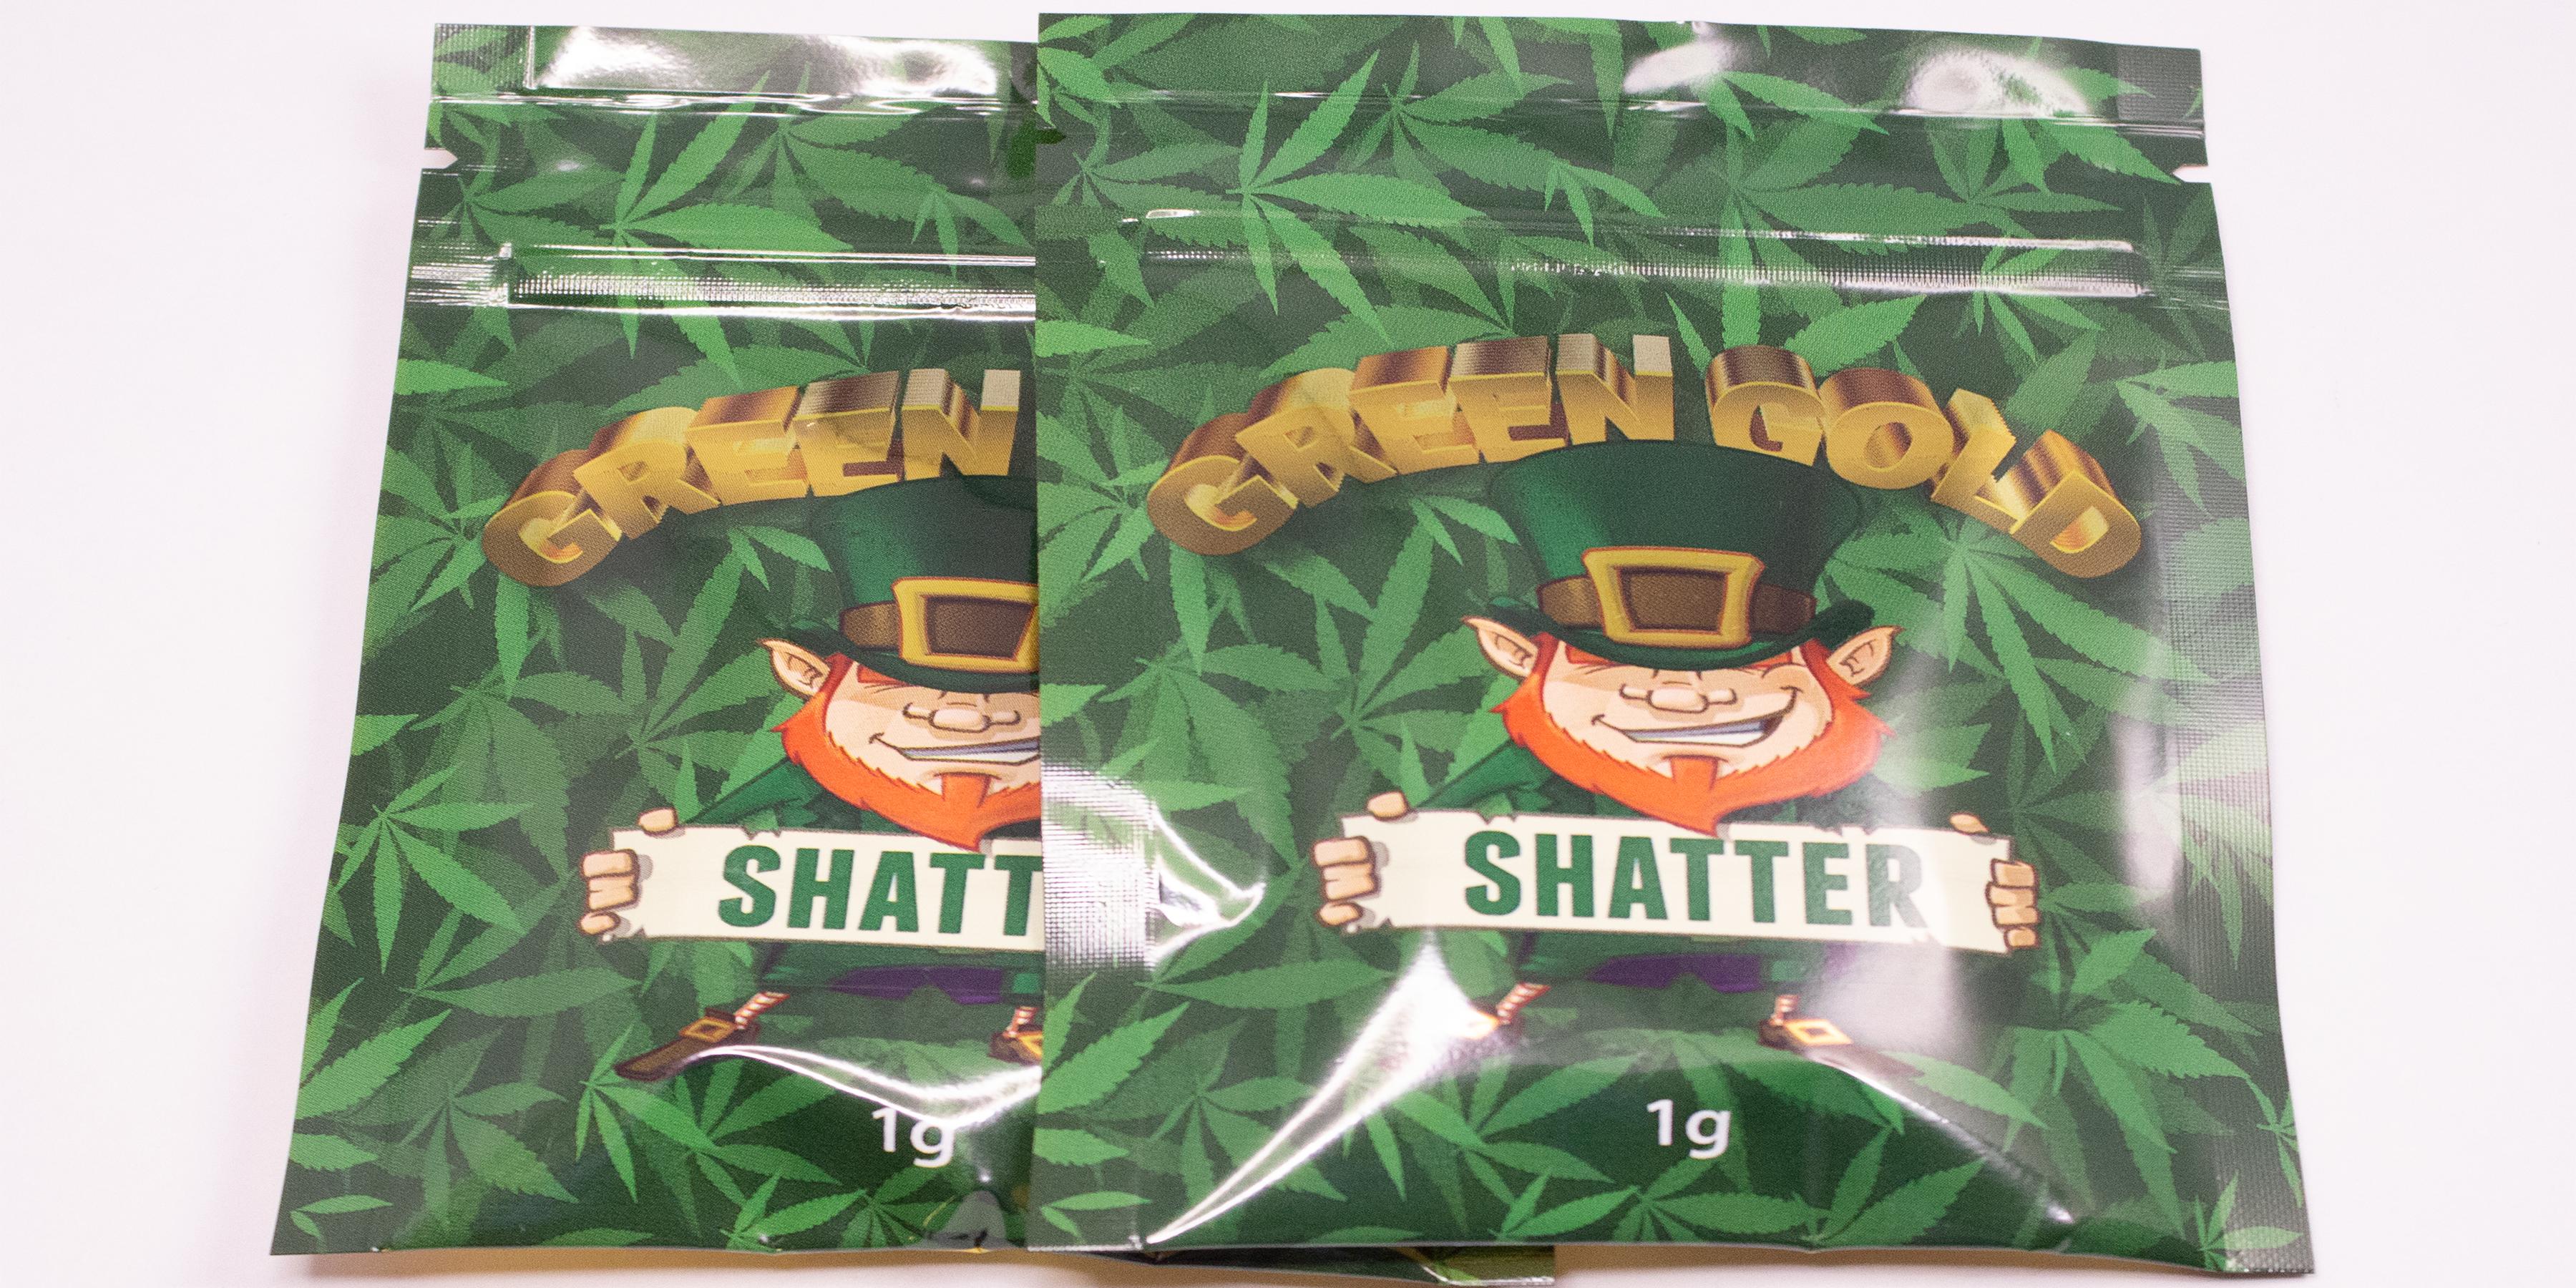 Online Dispensary Canada - Green Gold - The Original - Shatter